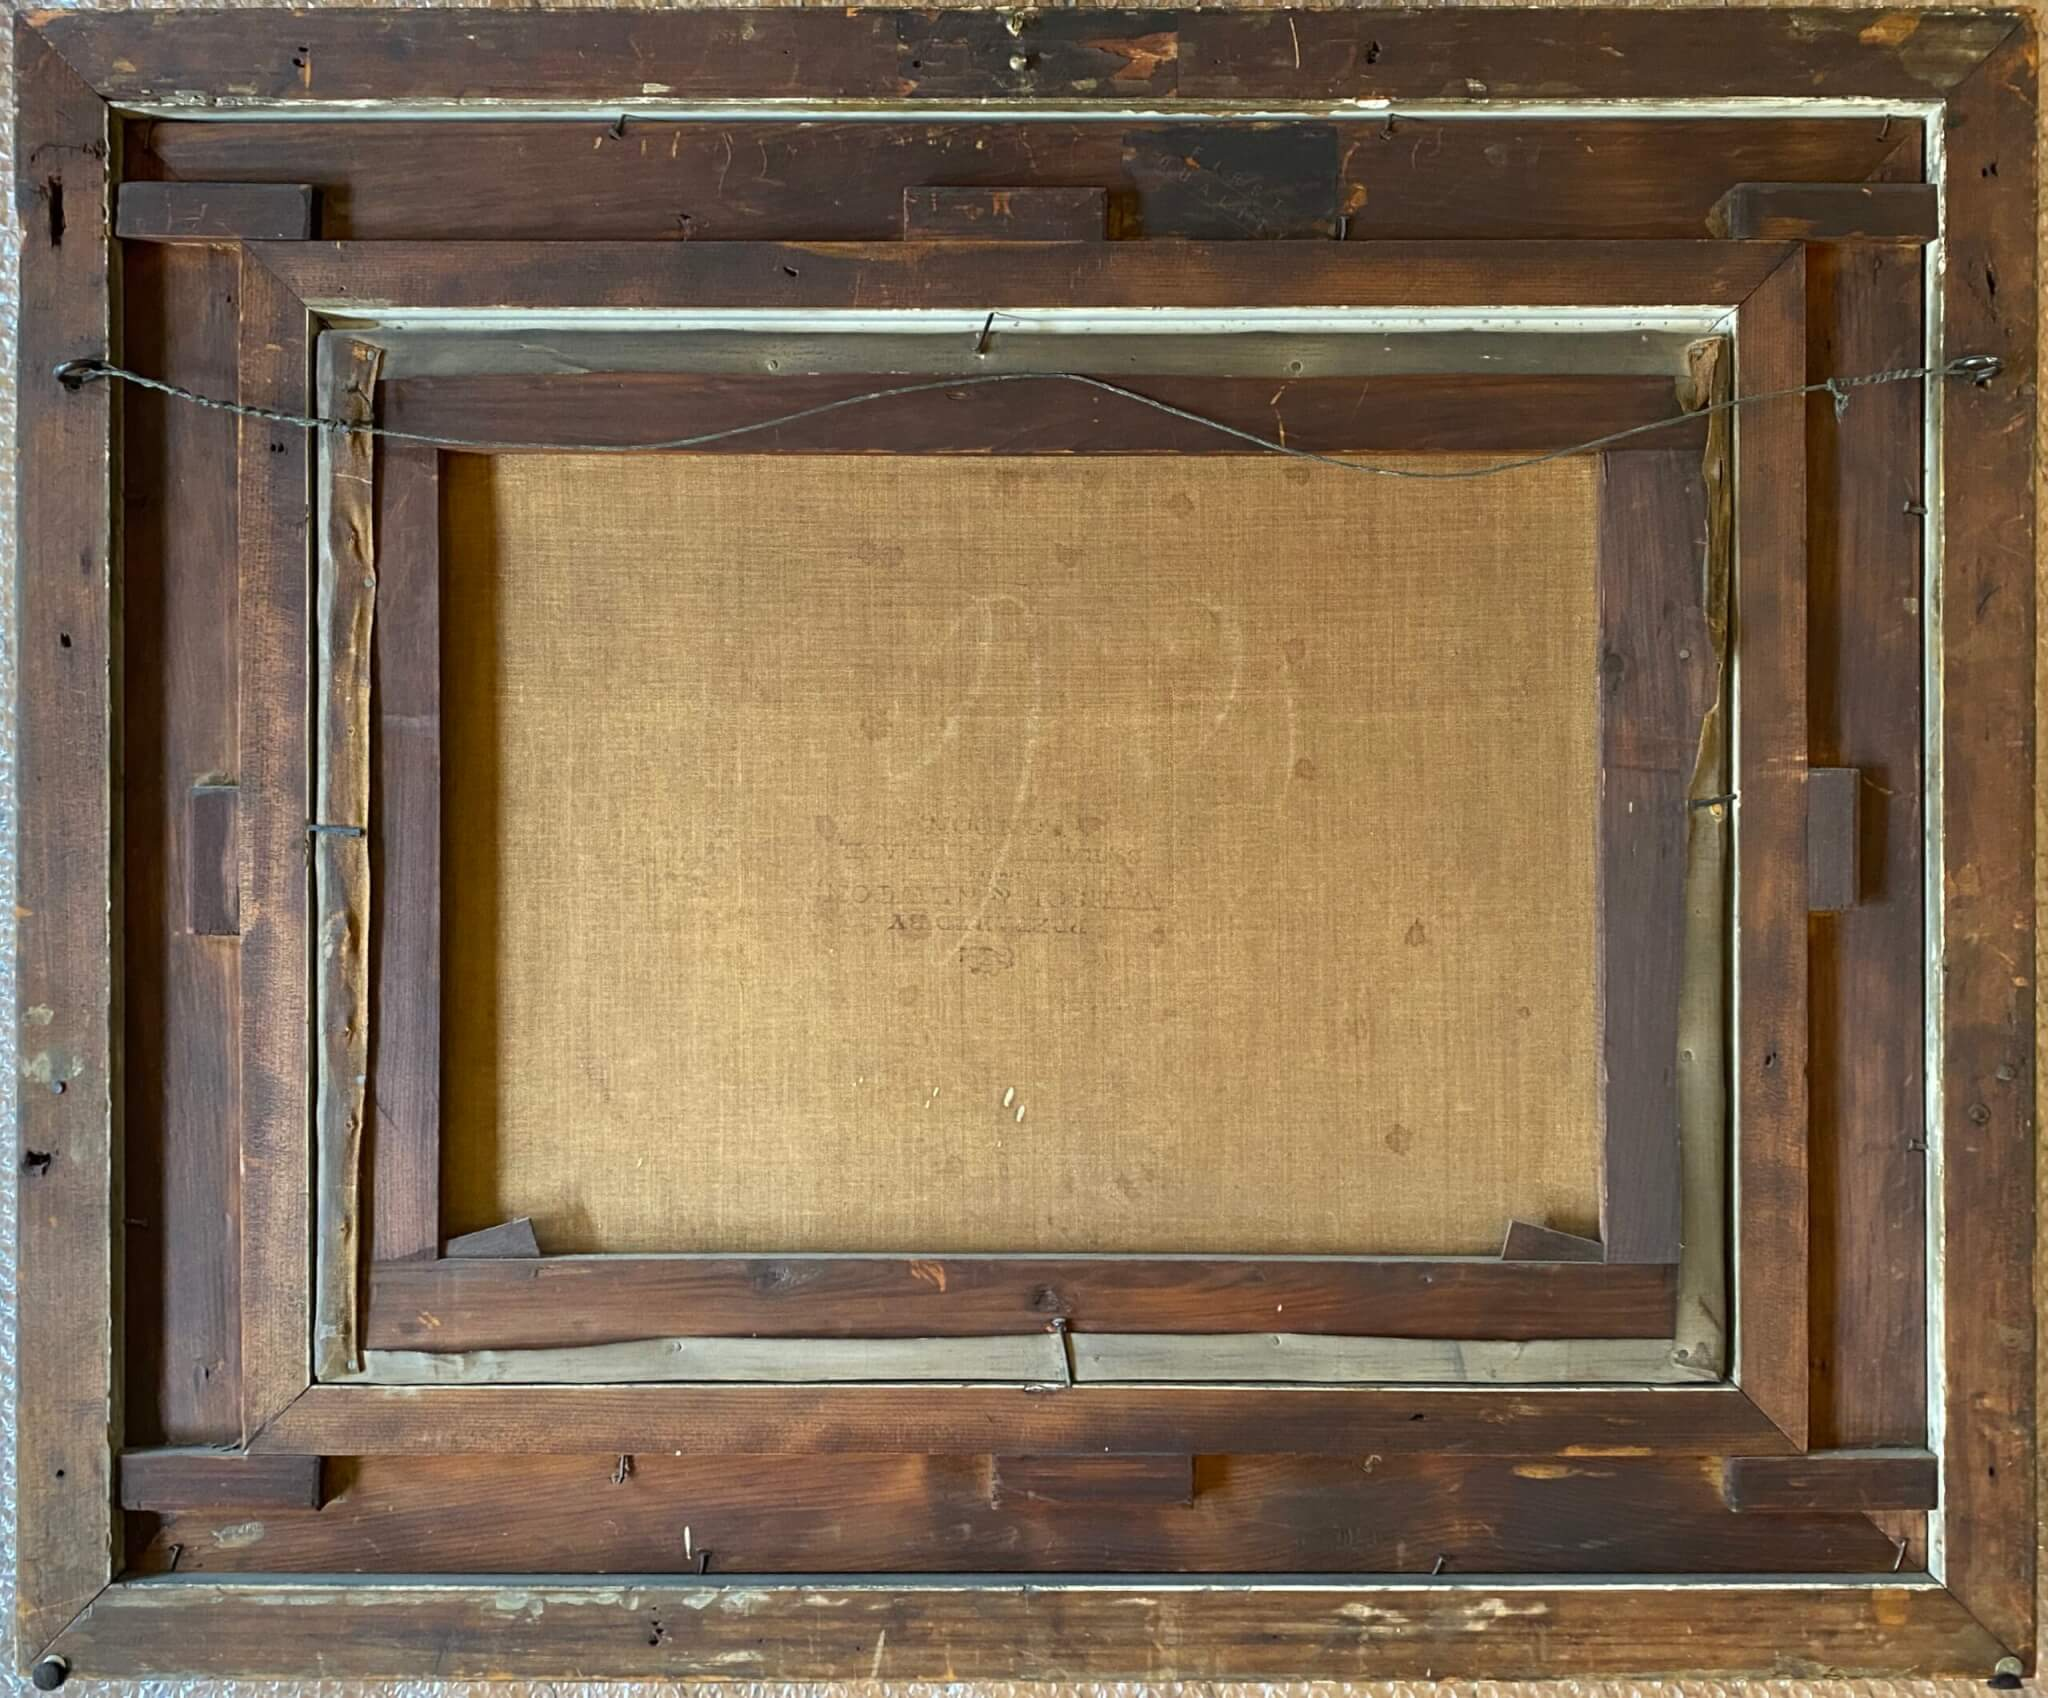 antique frame repair. Antique frame restoration. frame cleaning in Chicago